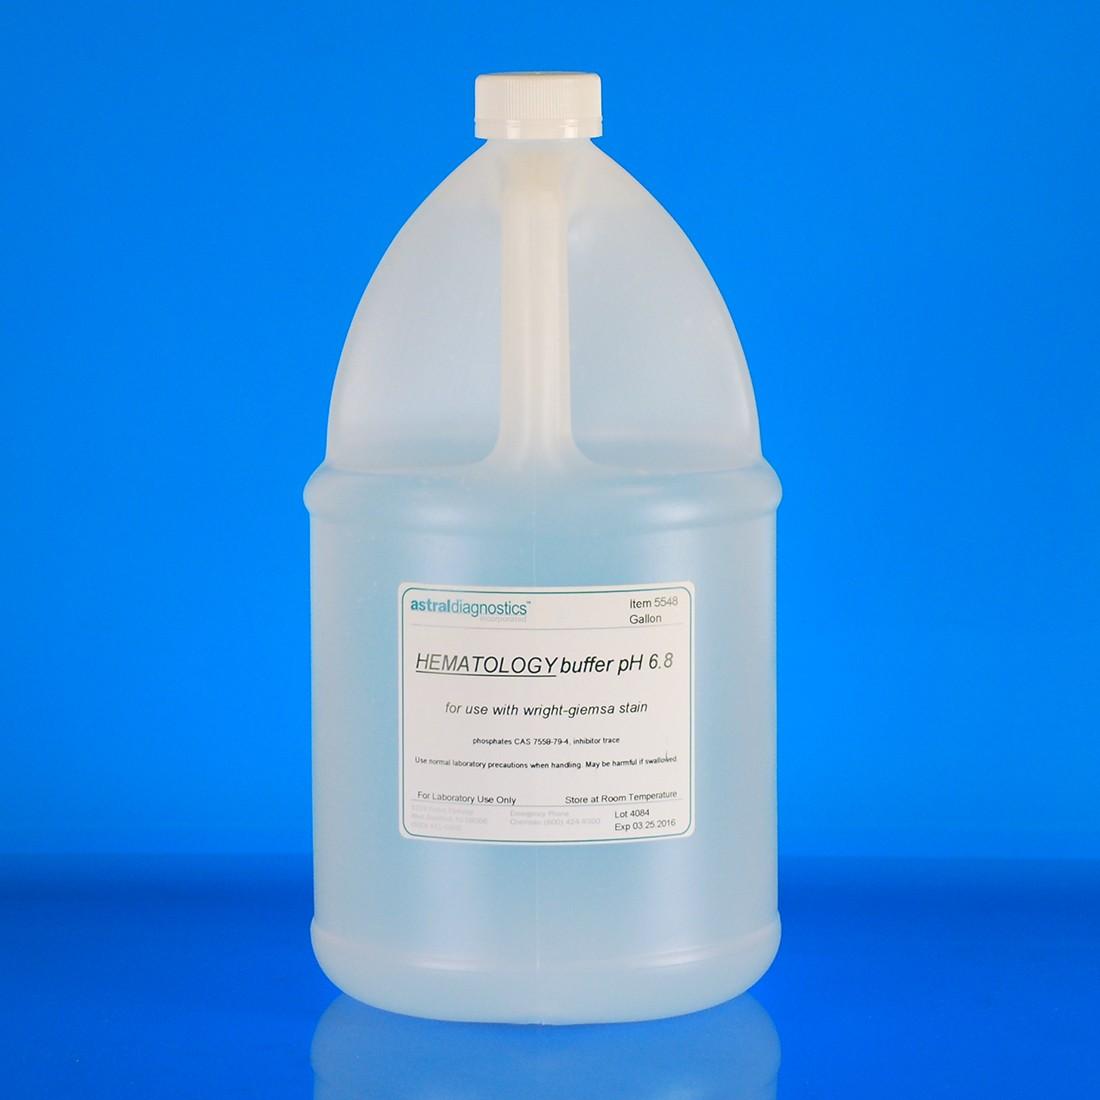 Hematology Buffer, pH 6.8 | Polysciences, Inc.